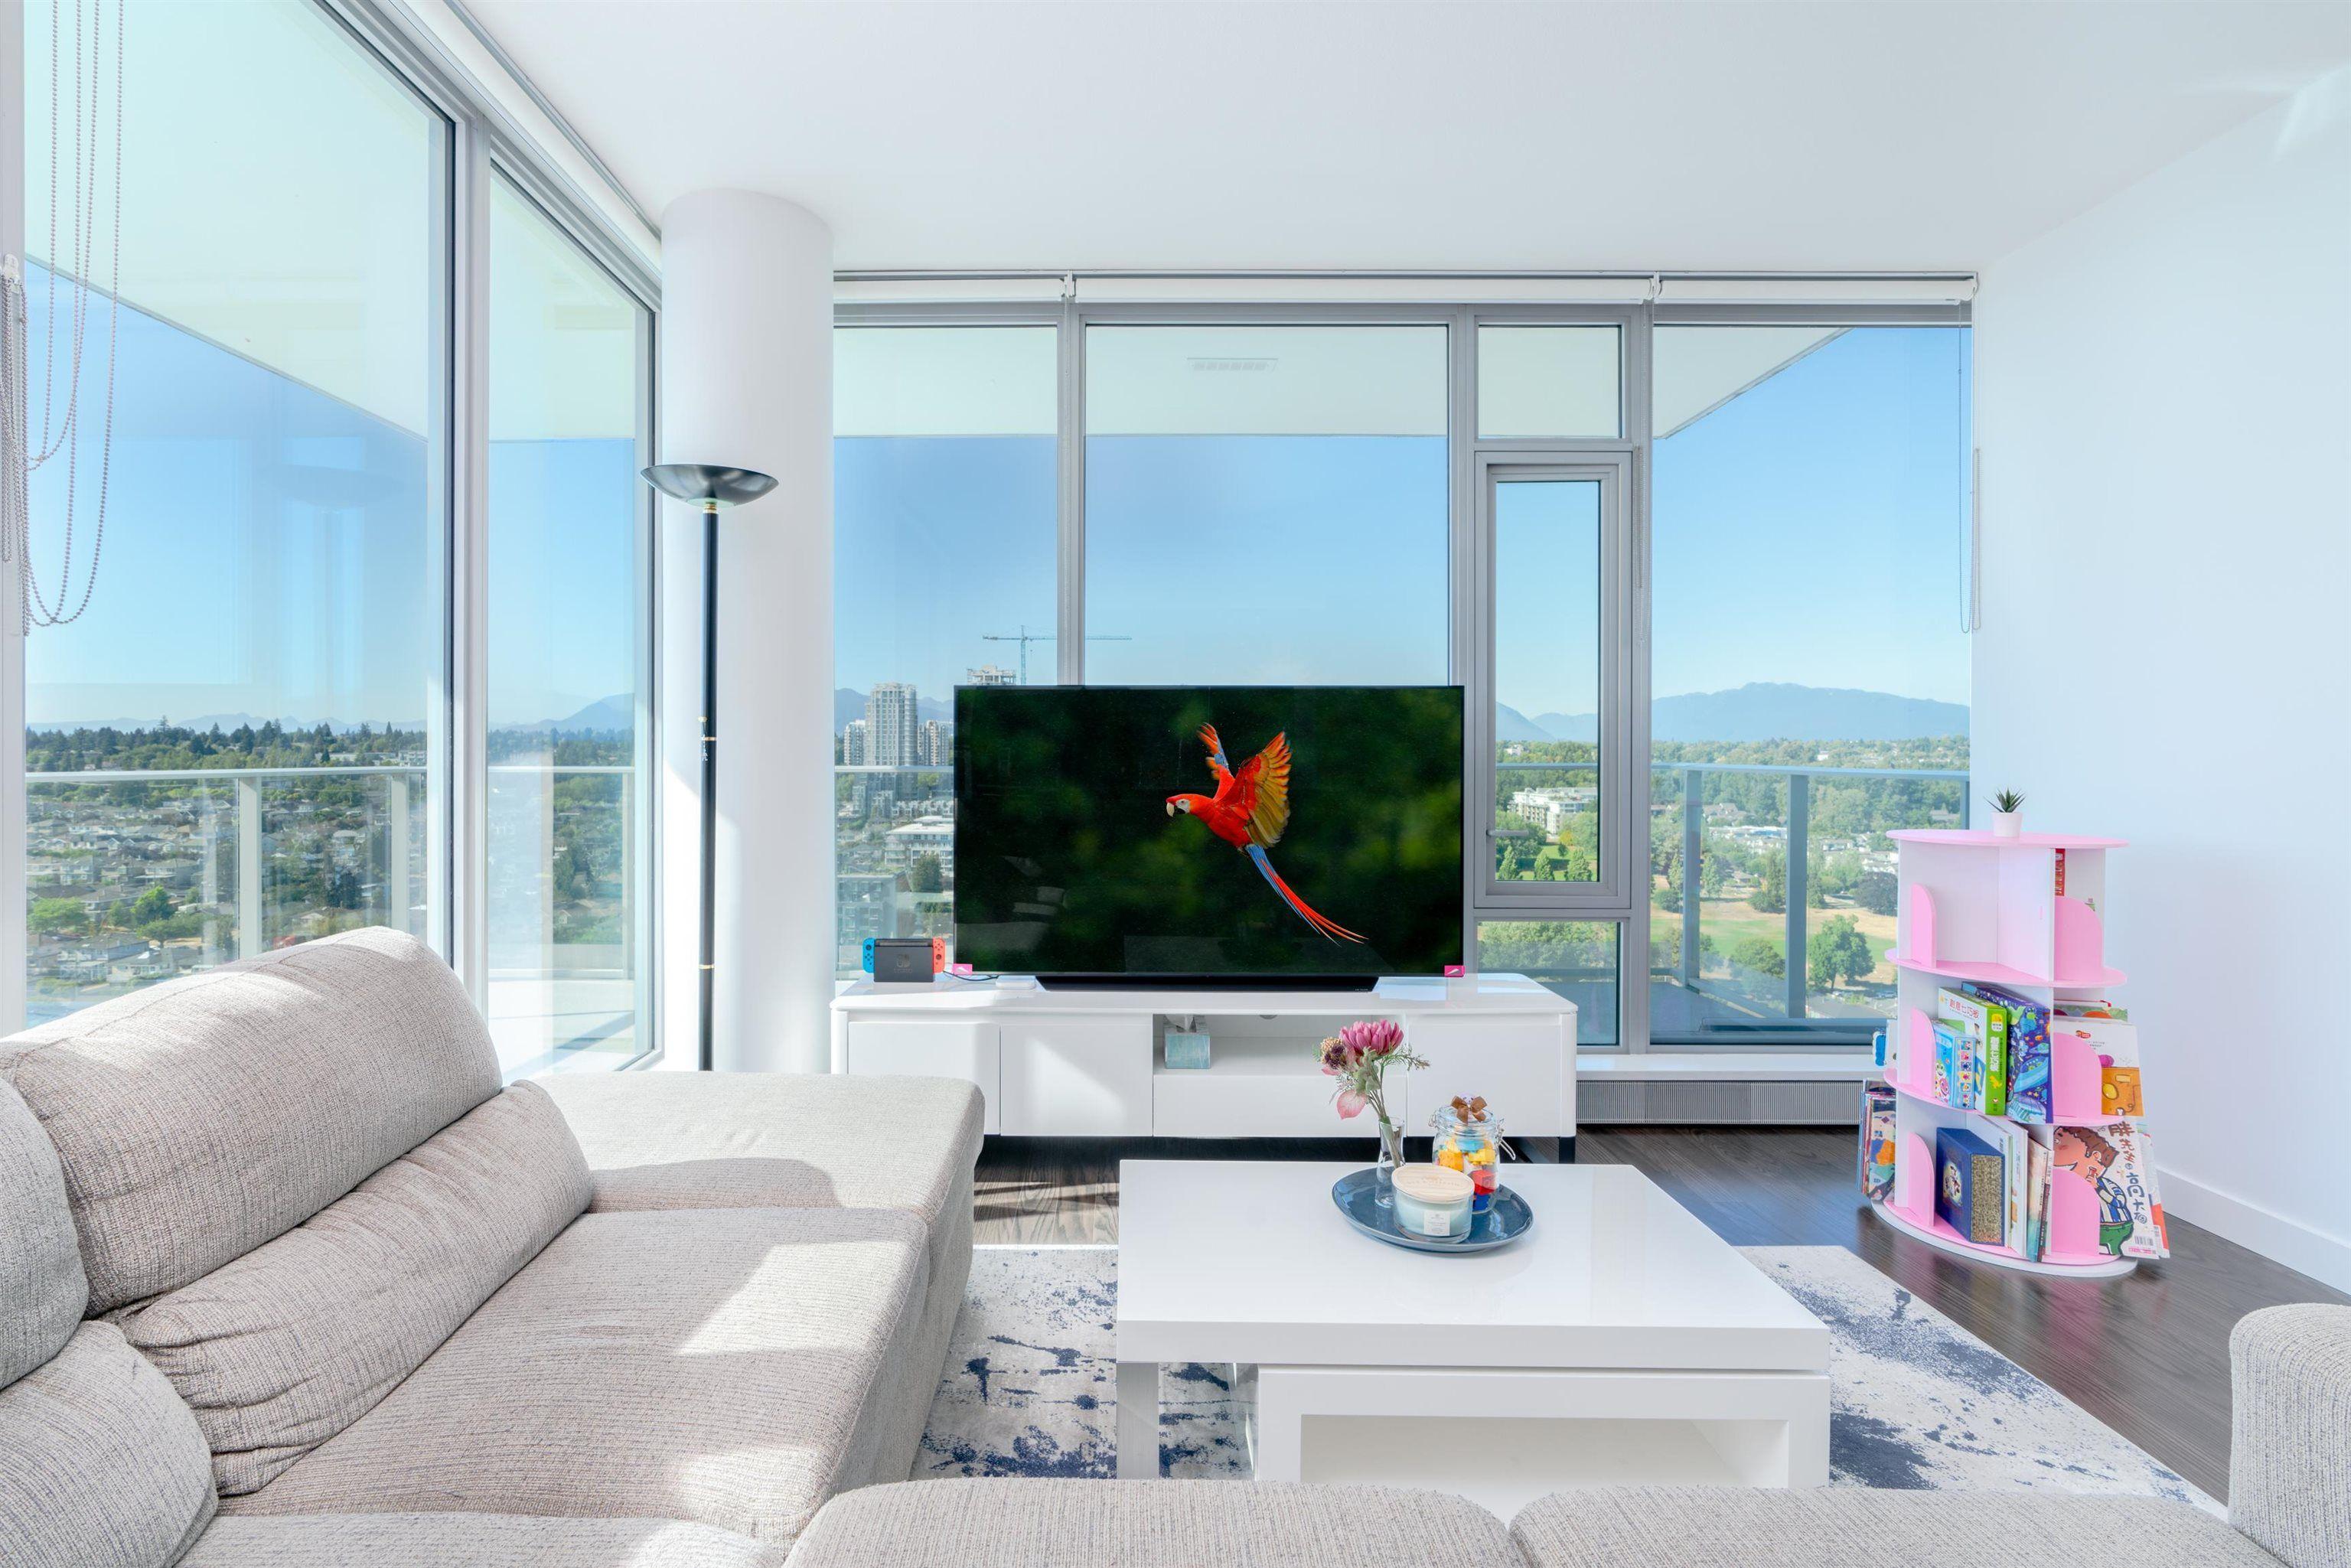 Main Photo: 2601 8031 NUNAVUT LANE in Vancouver: Marpole Condo for sale (Vancouver West)  : MLS®# R2609219